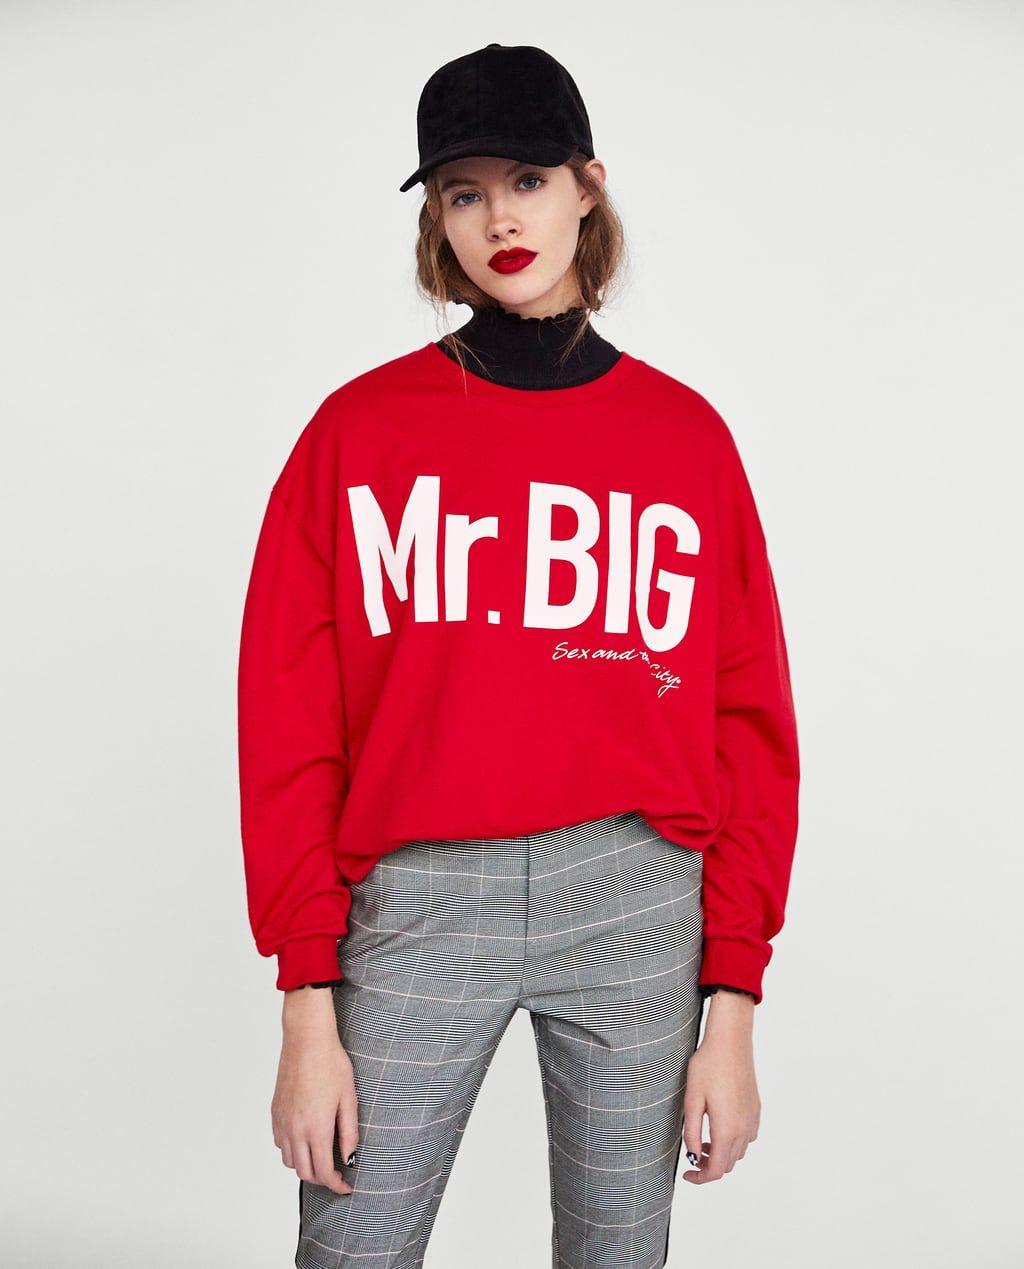 837b0bd8 mr.big sweatshirt zara ile ilgili görsel sonucu | Not a princess